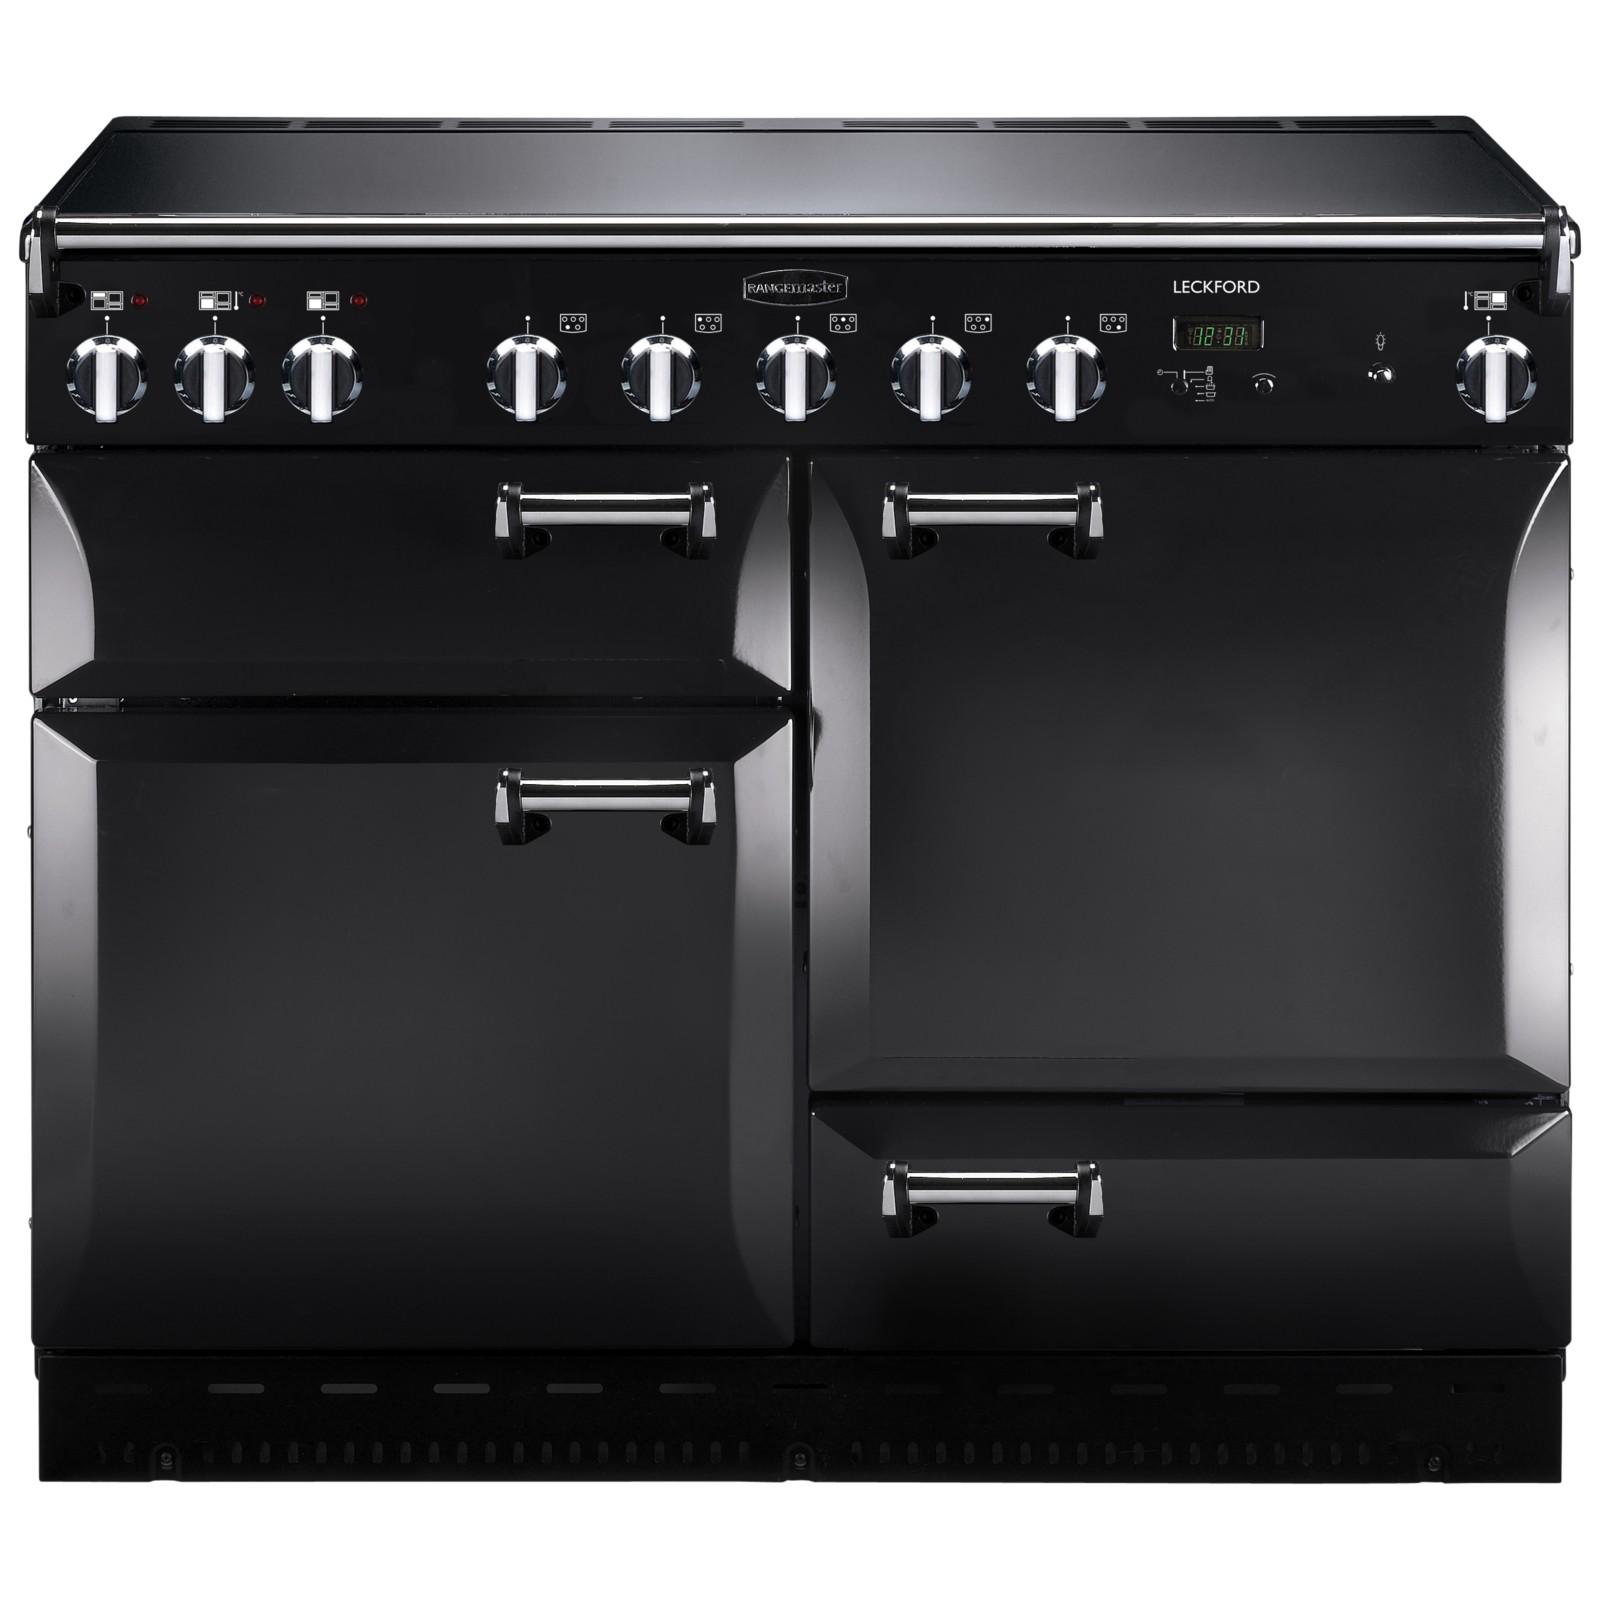 Rangemaster Leckford 110cm Electric Induction Range Cooker Black/Chrome